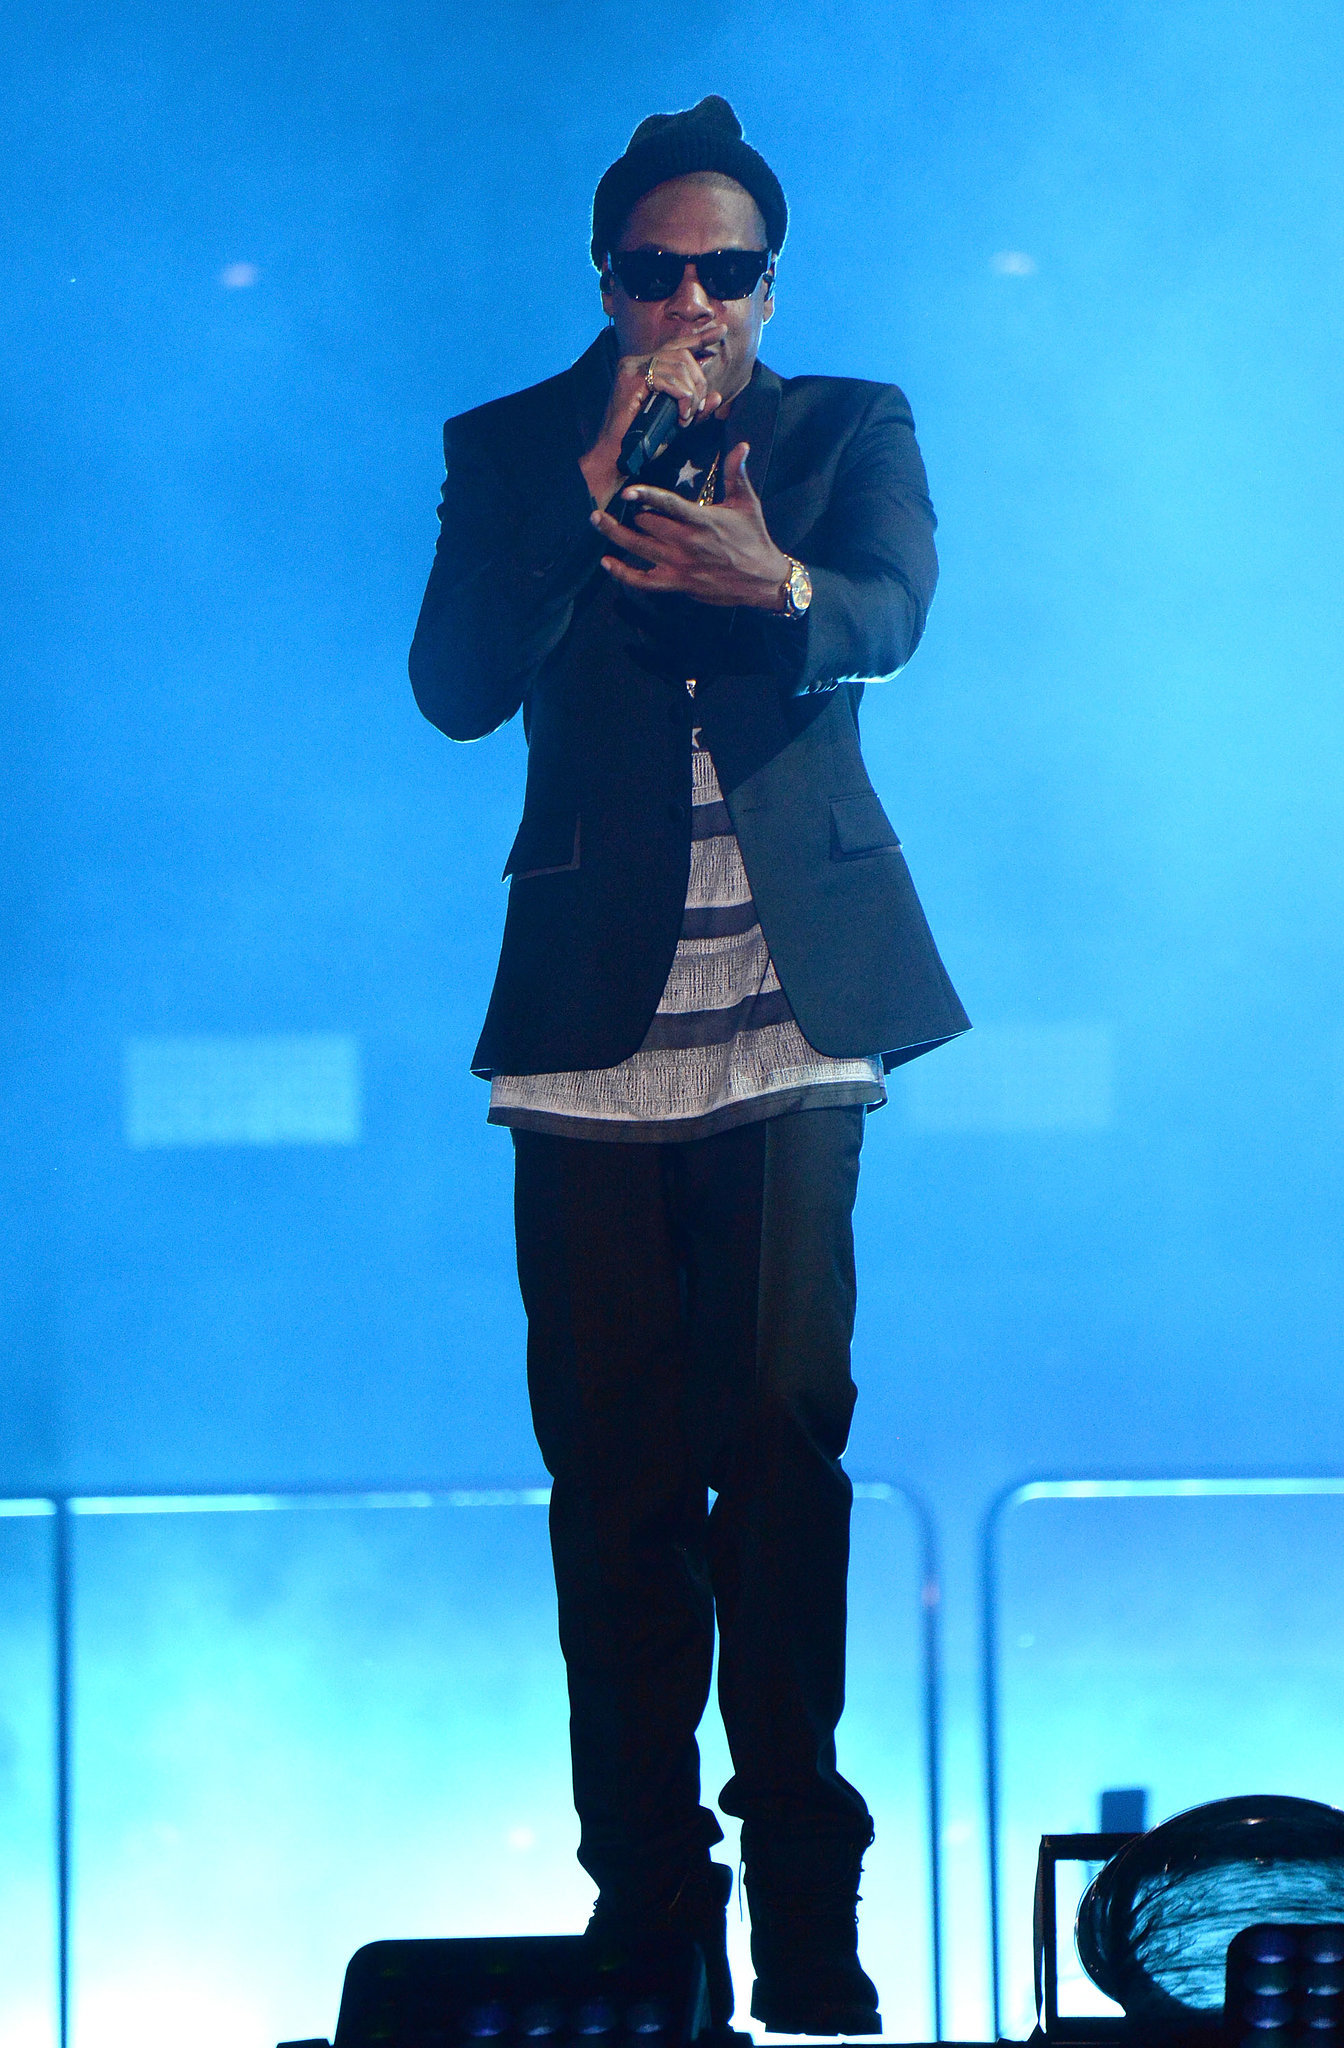 Jay Z in a Givenchy